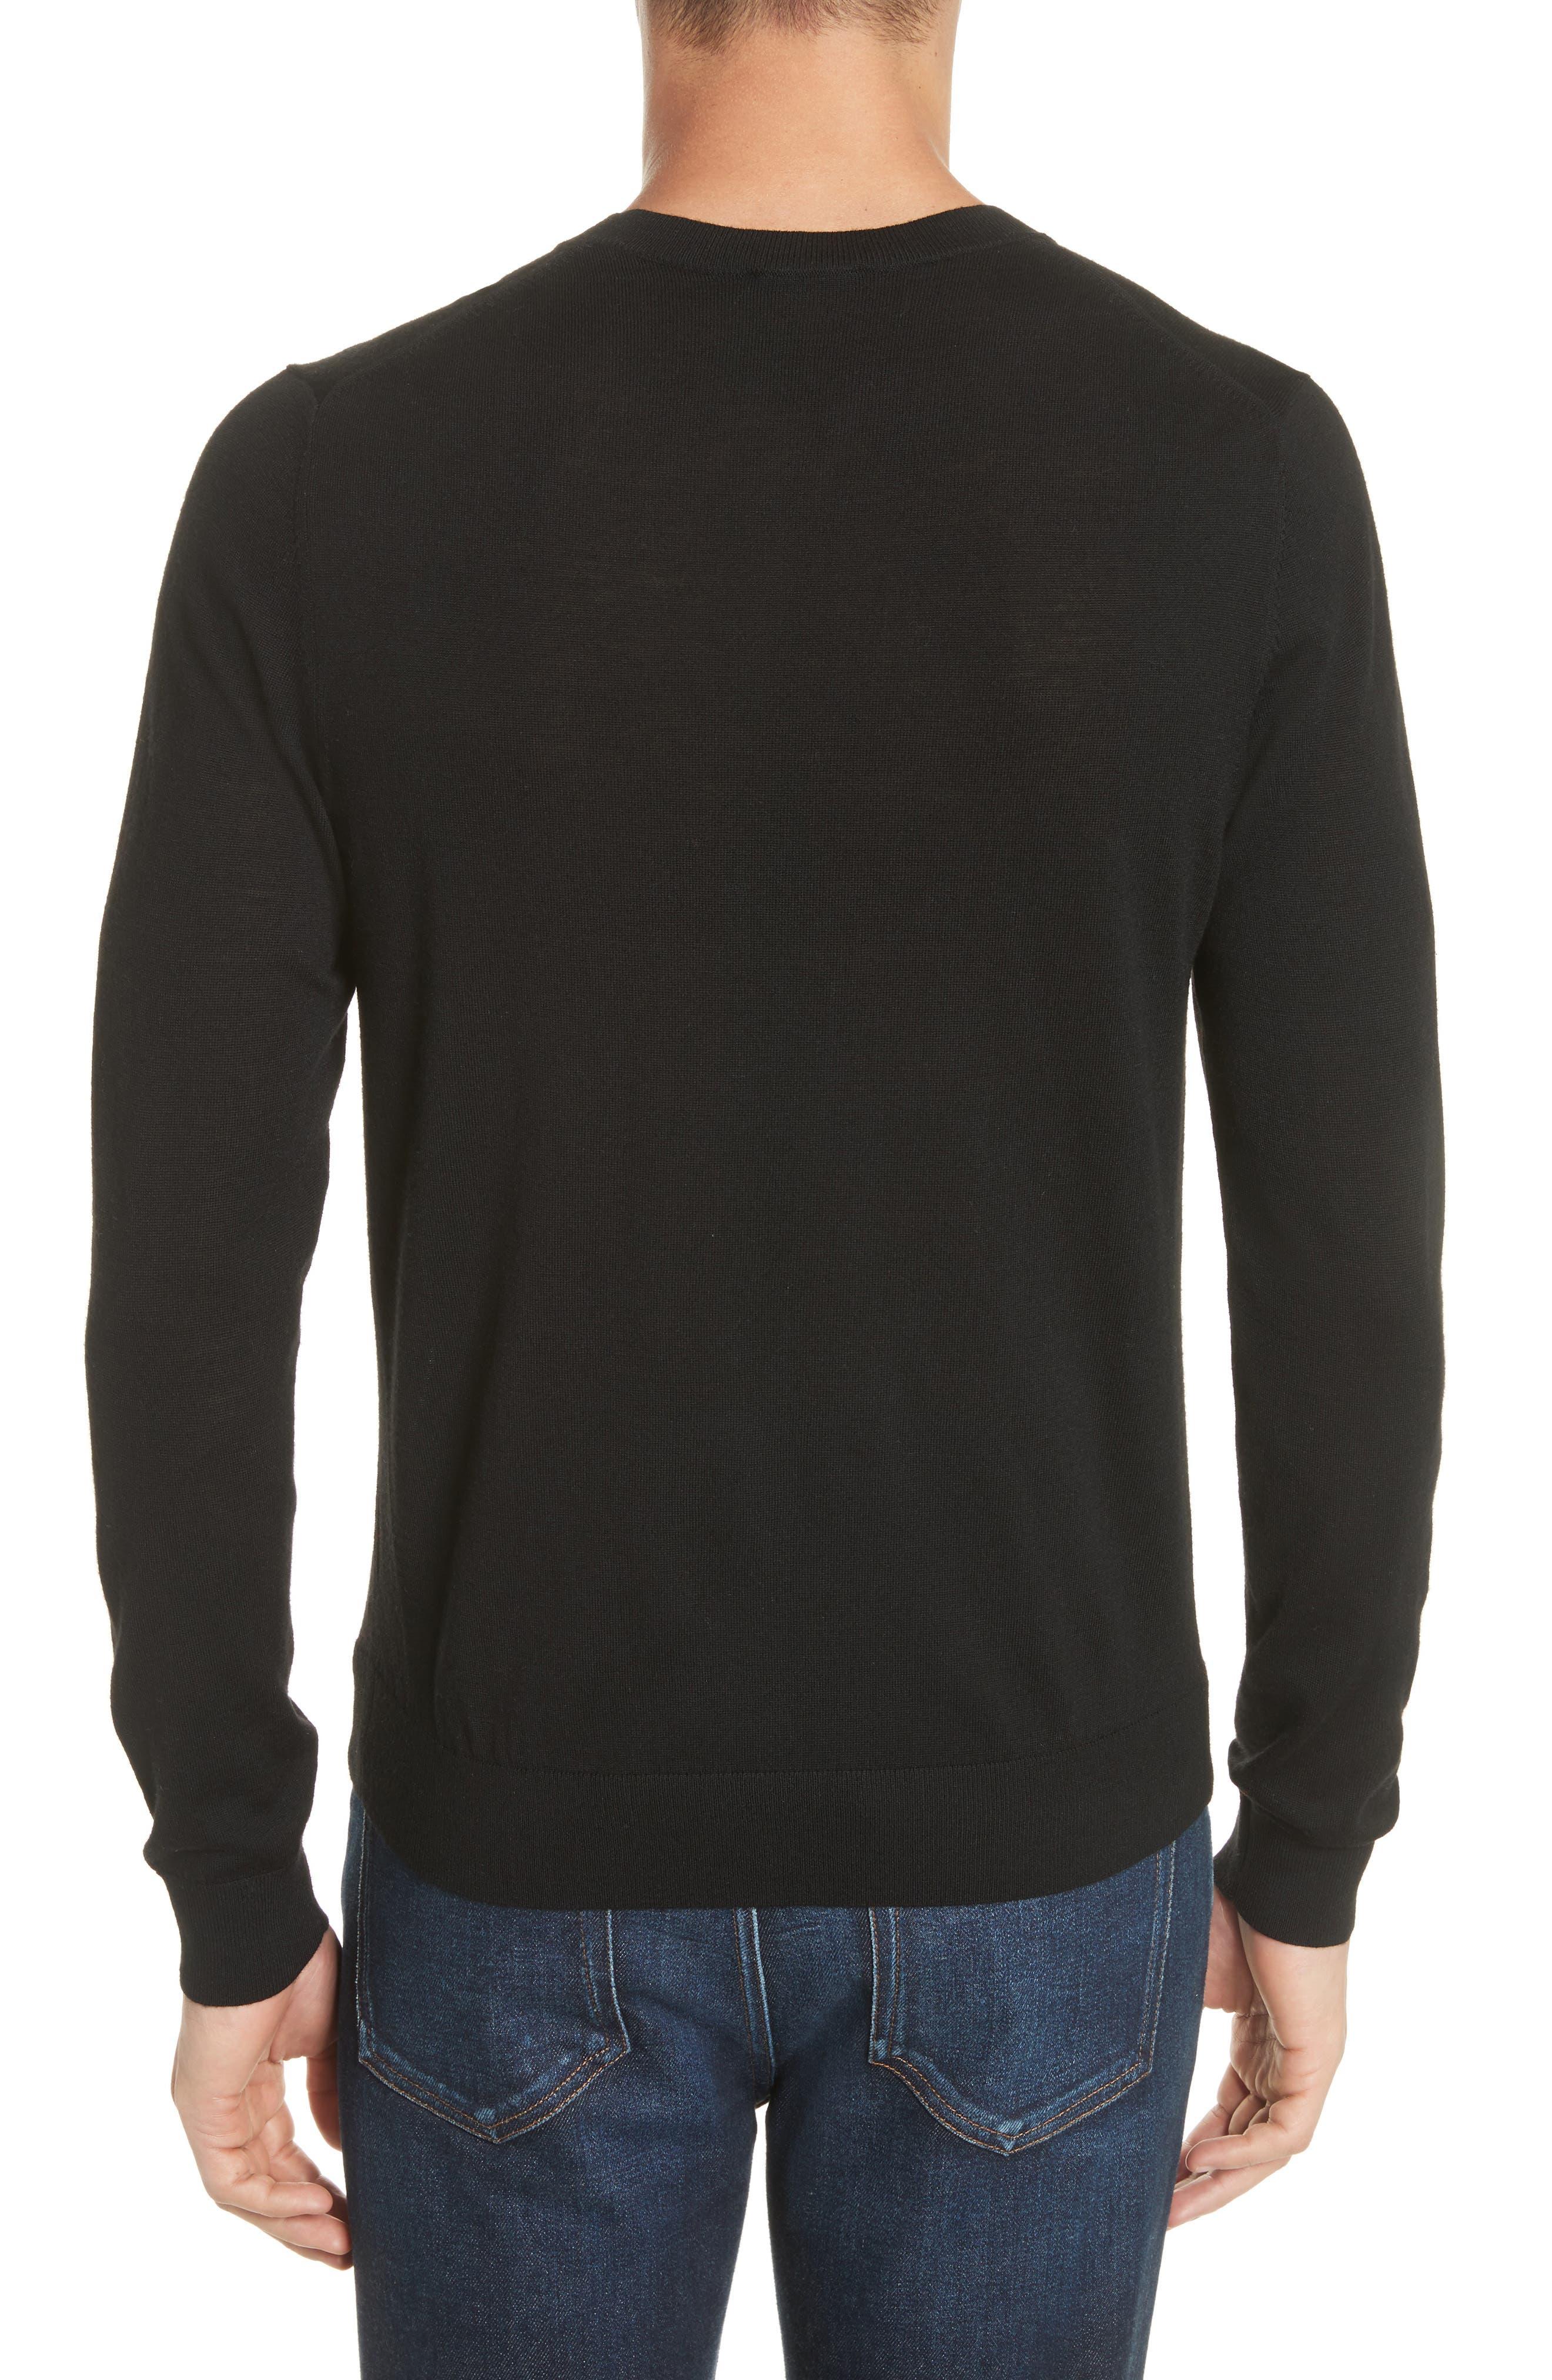 Circle Merino Wool Blend Sweater,                             Alternate thumbnail 2, color,                             001